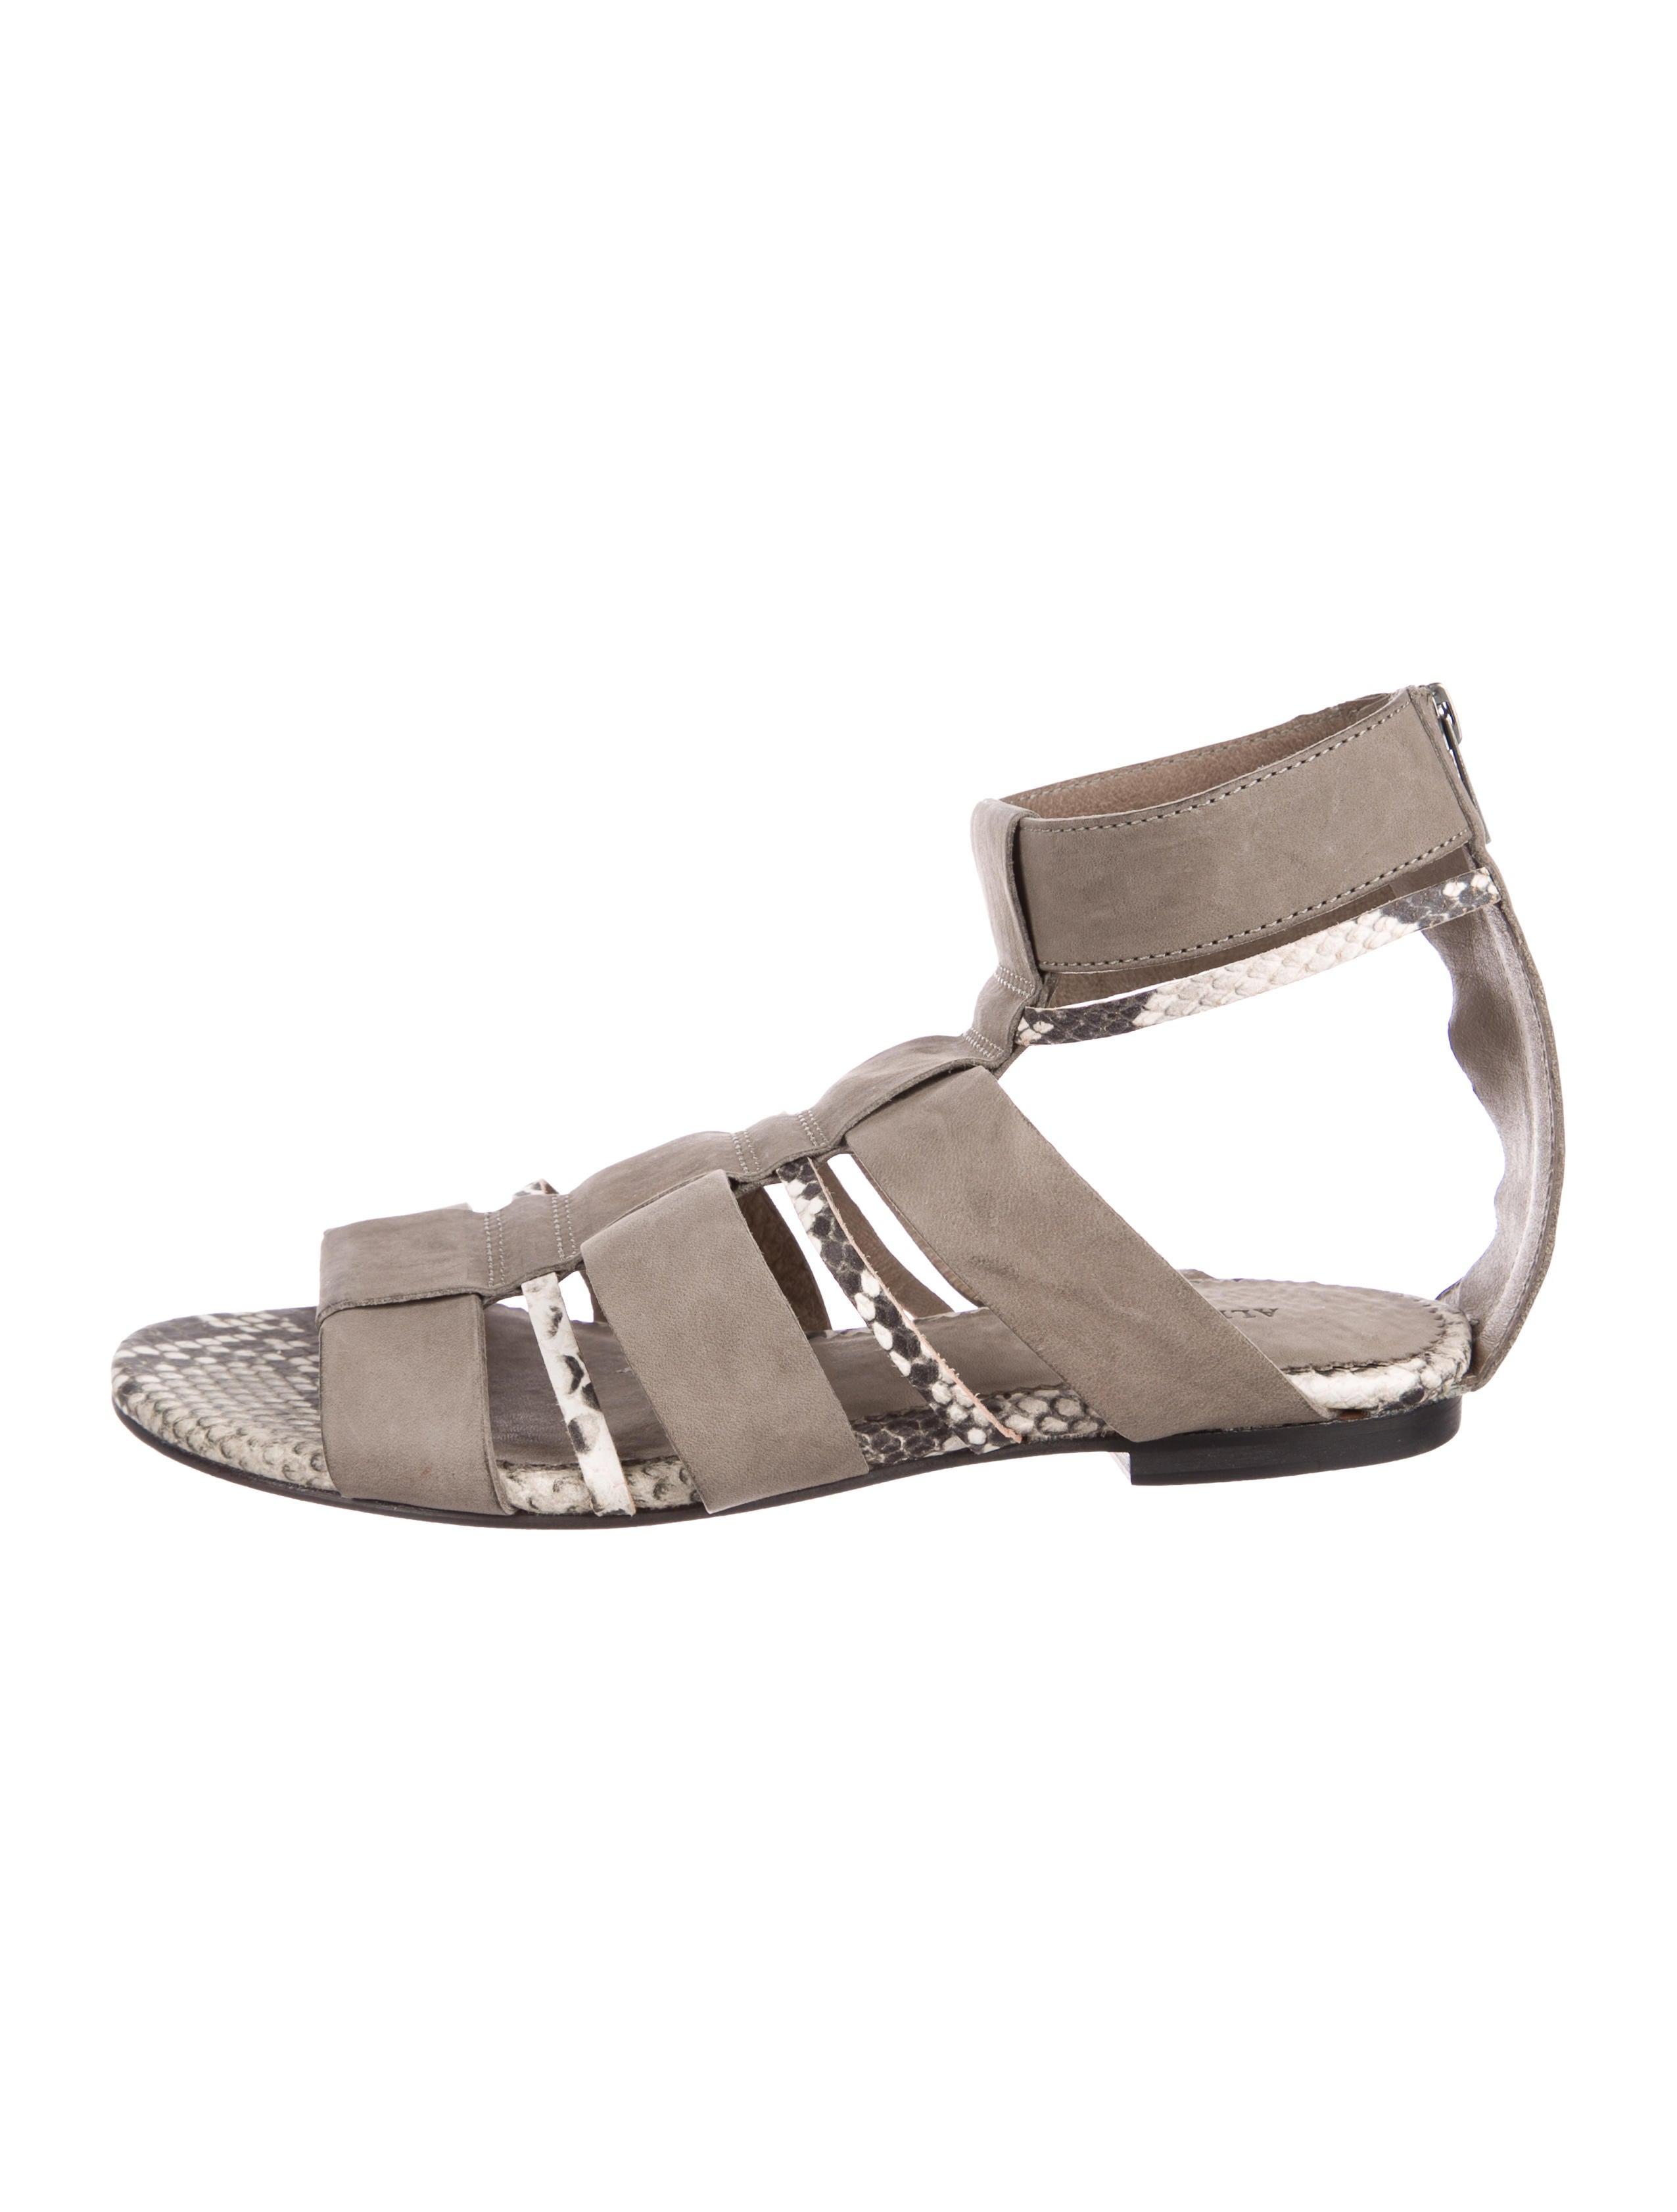 discount hot sale Inexpensive cheap online AllSaints Phoenix Suede Sandals outlet ebay cheap pre order free shipping release dates Gr8SXX